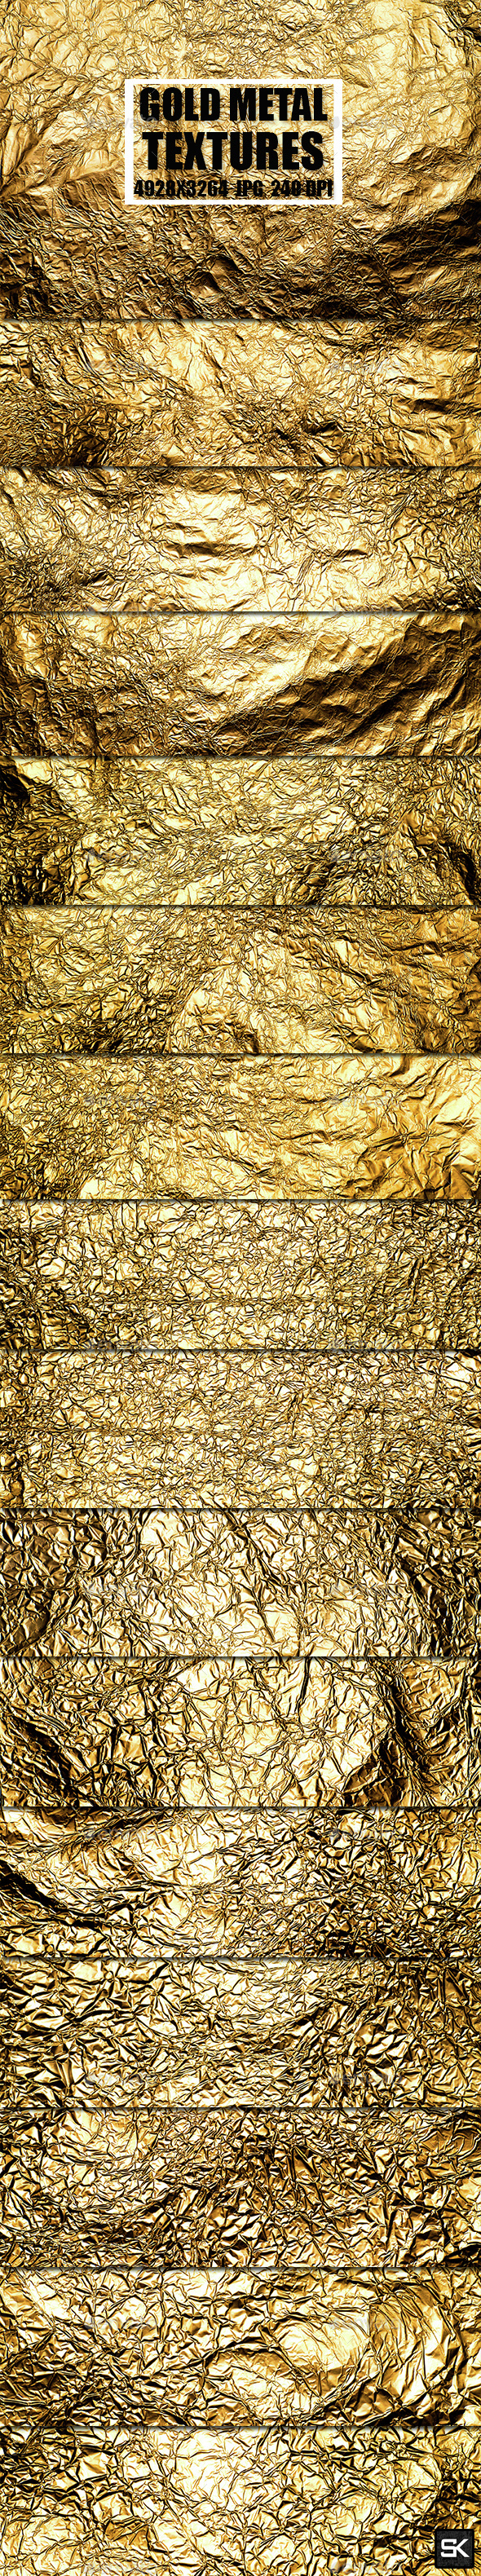 Gold Metal Textures 2 - Metal Textures